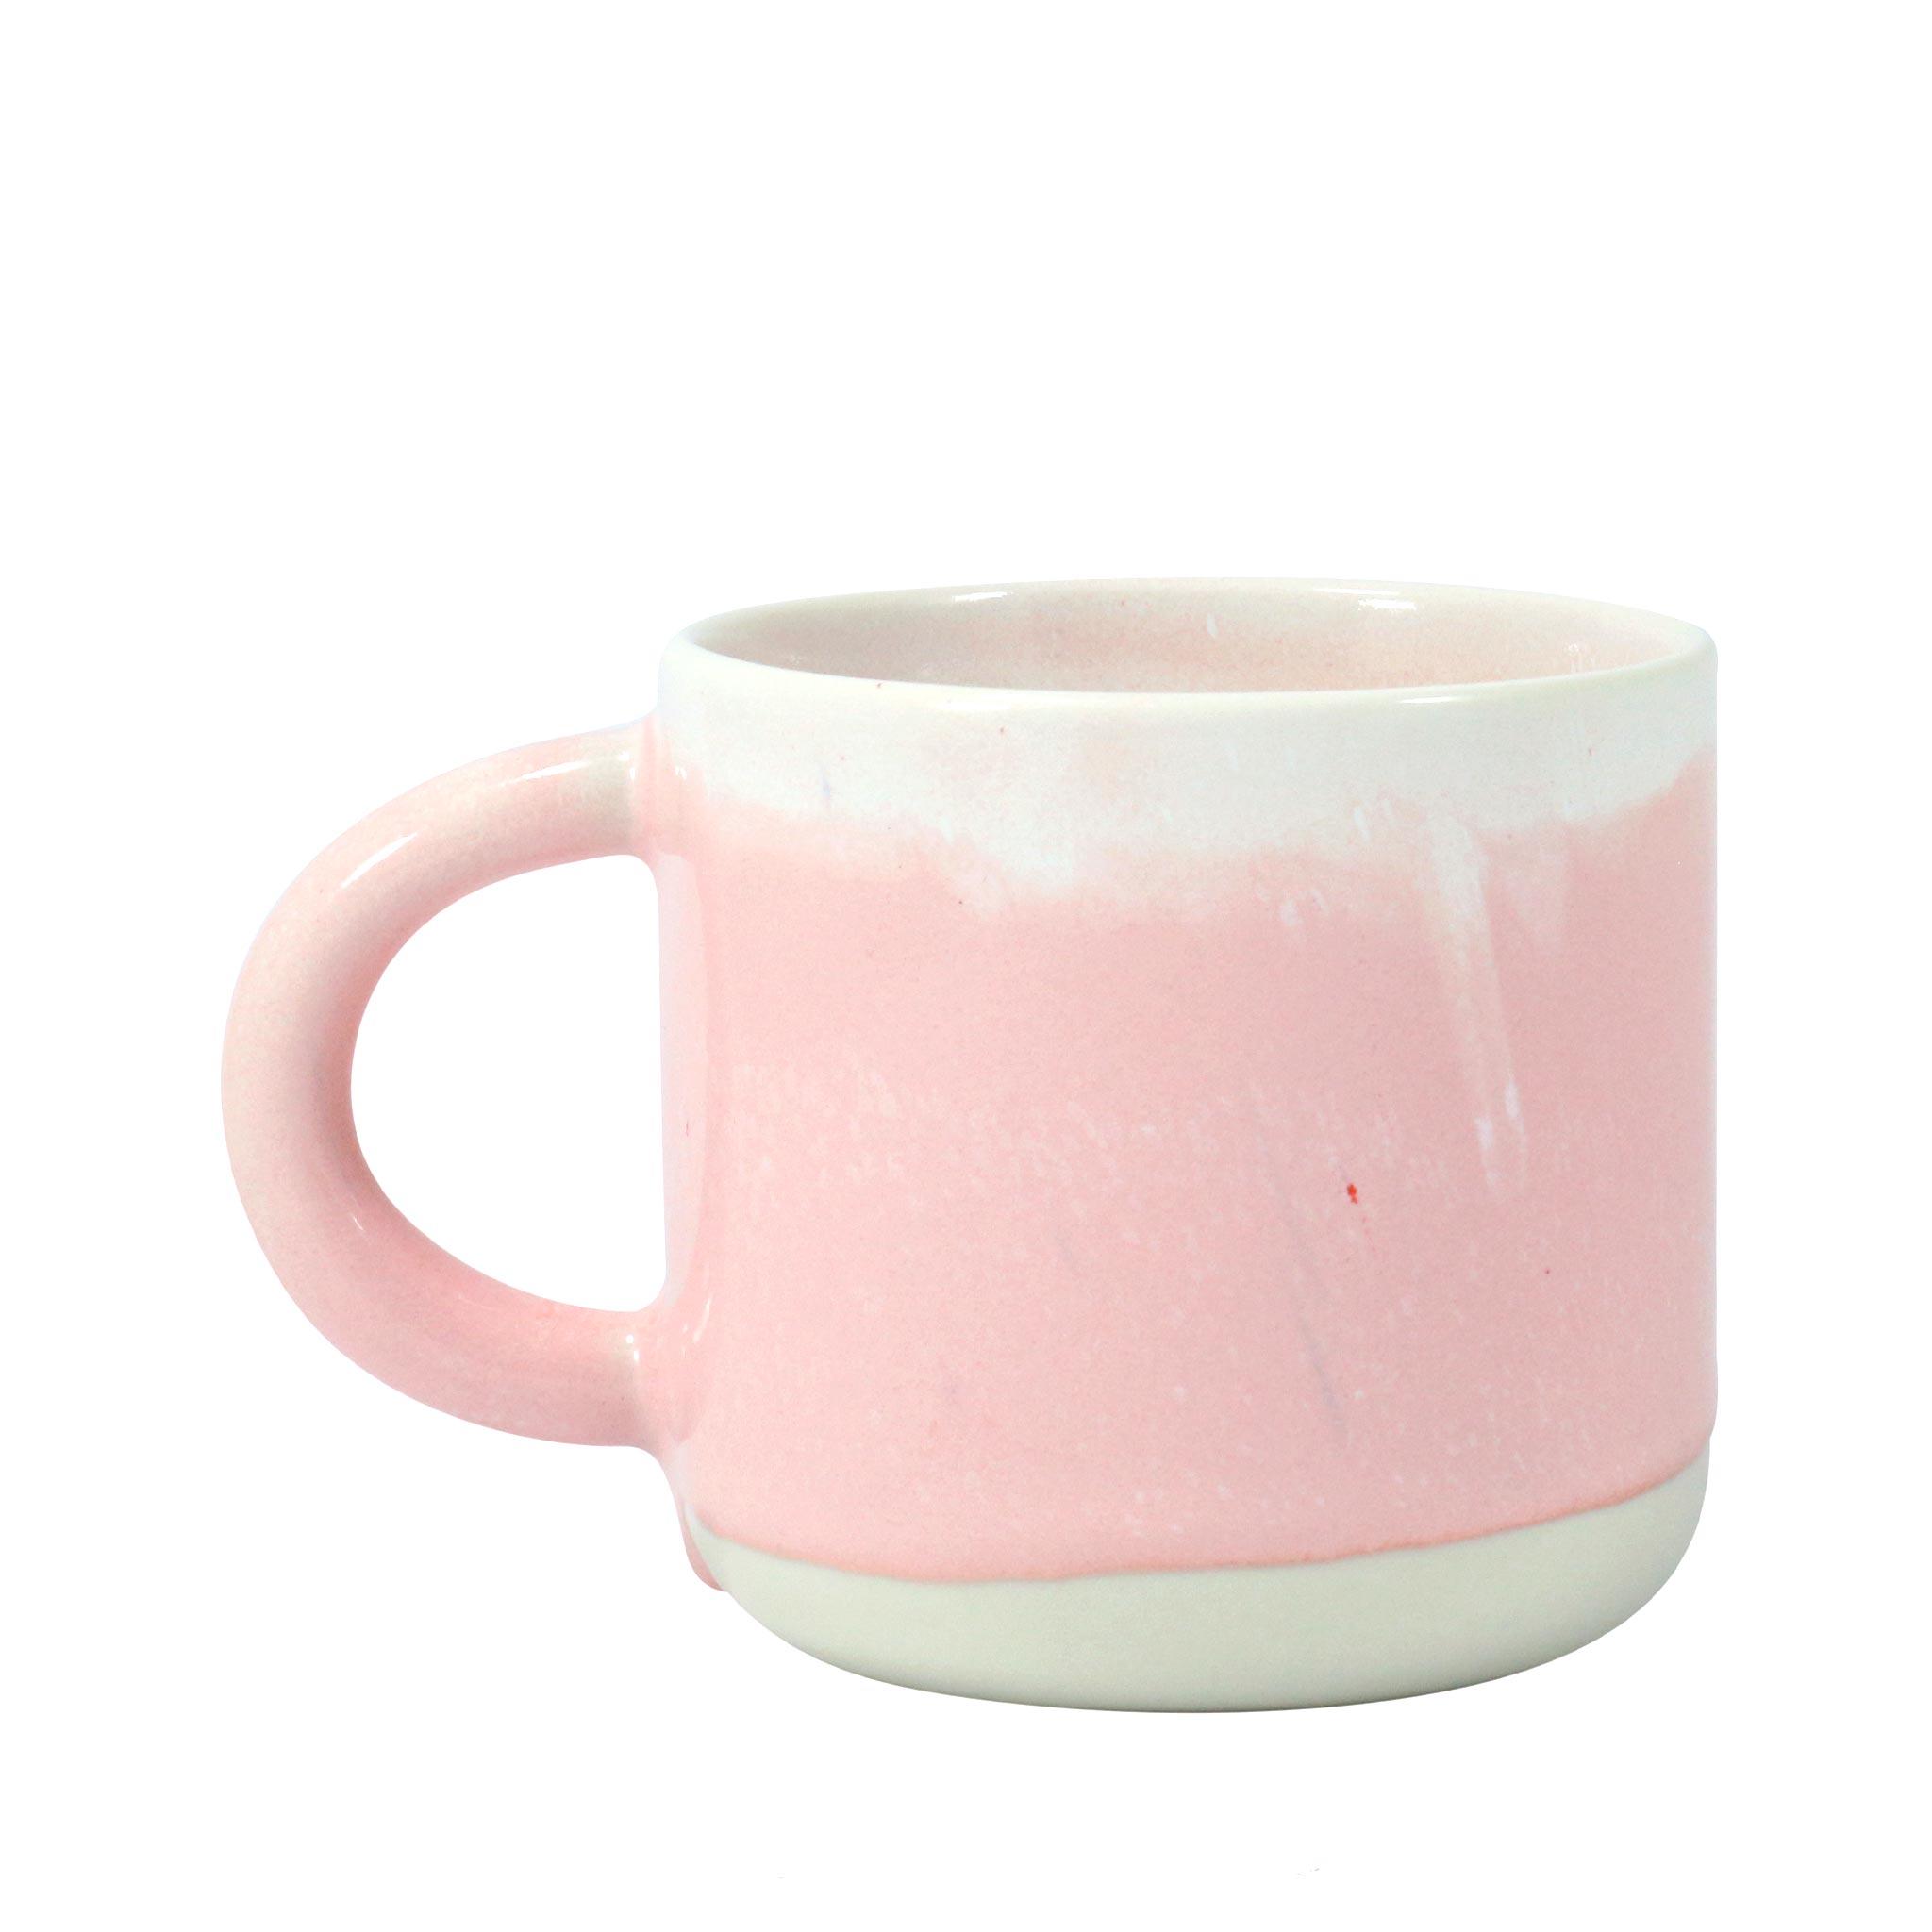 STUDIO ARHØJ - Chug Mug, Pink Mink